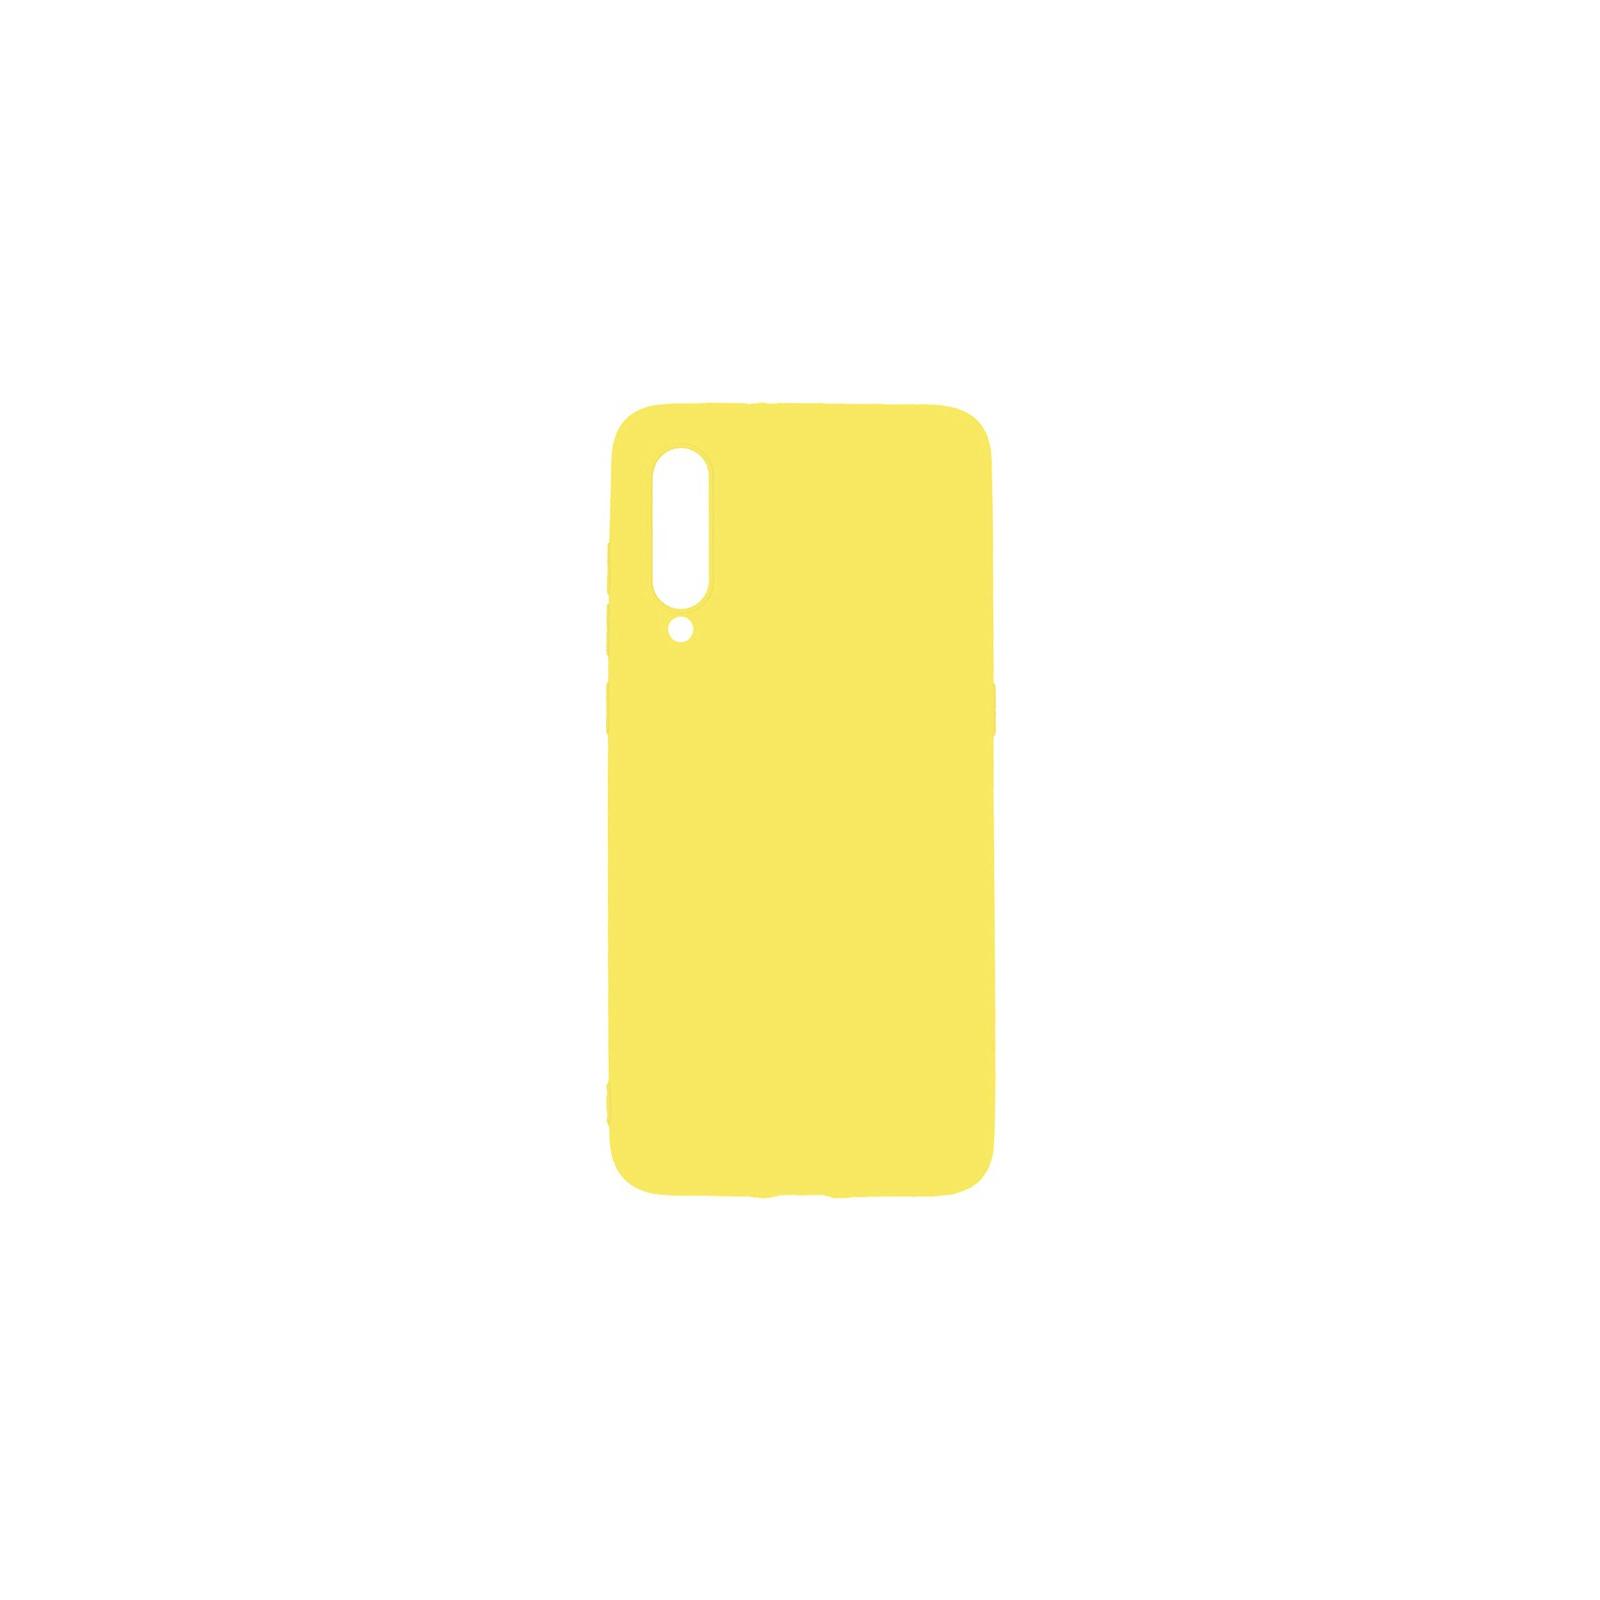 Чехол для моб. телефона Toto 1mm Matt TPU Case Xiaomi Mi 9 Yellow (F_93868)